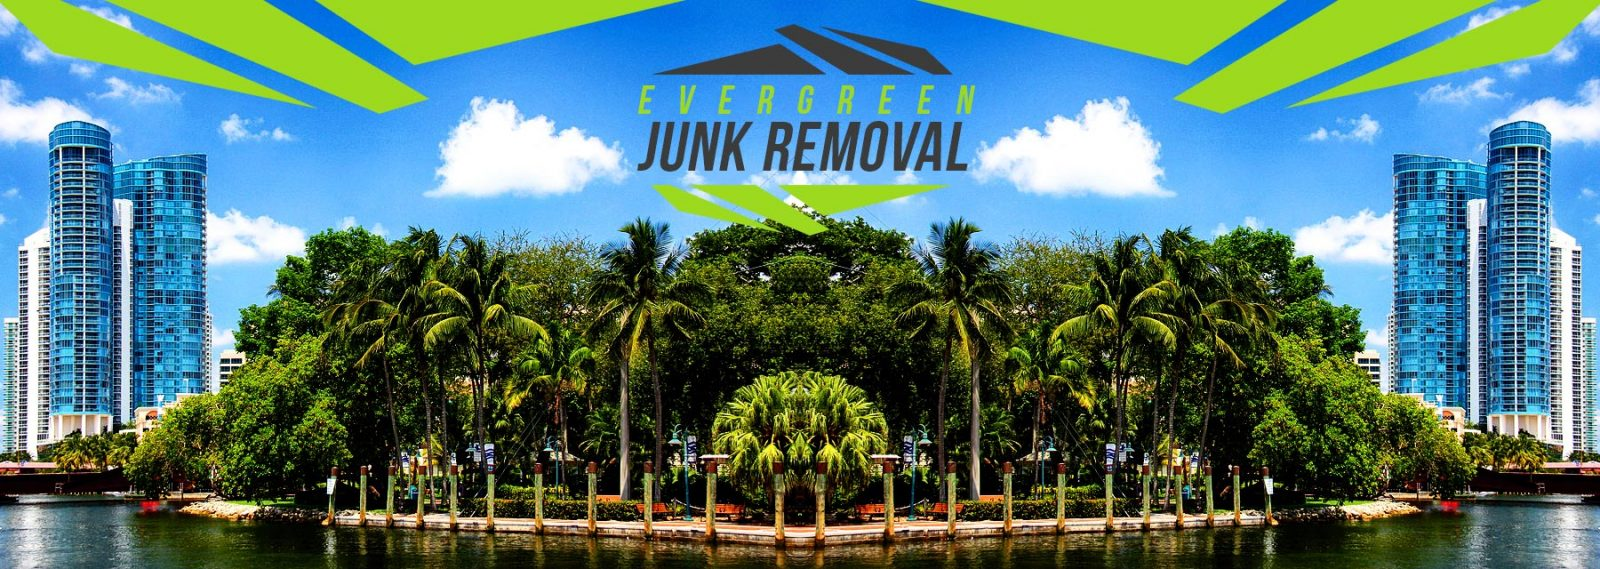 Miramar Hot Tub Removal Company